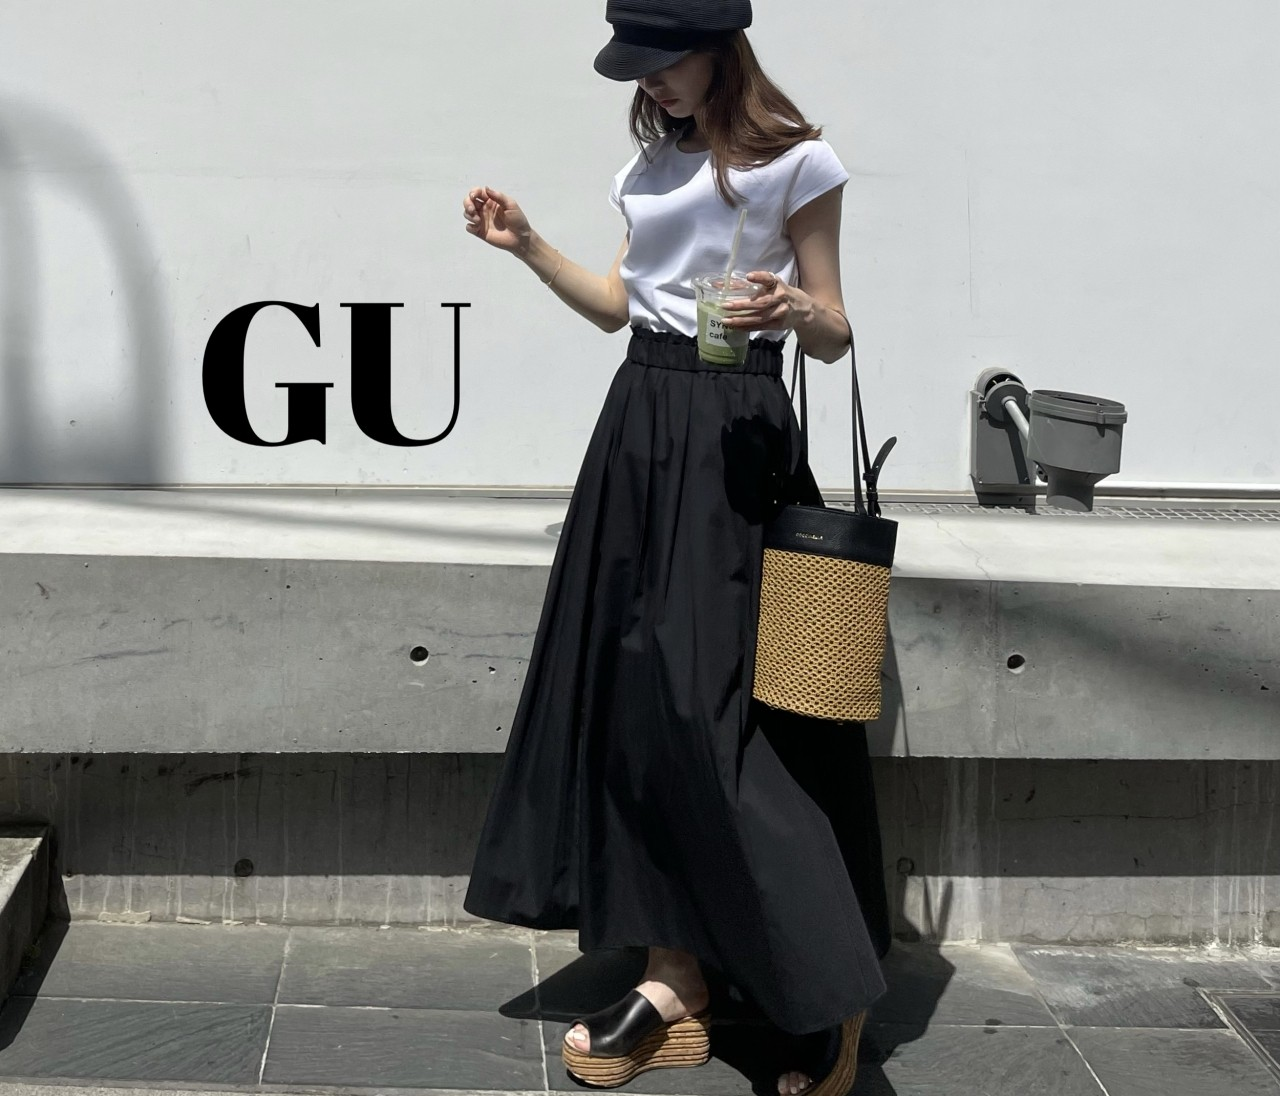 【GU】話題のマーセライズドTできれいめカジュアル♡